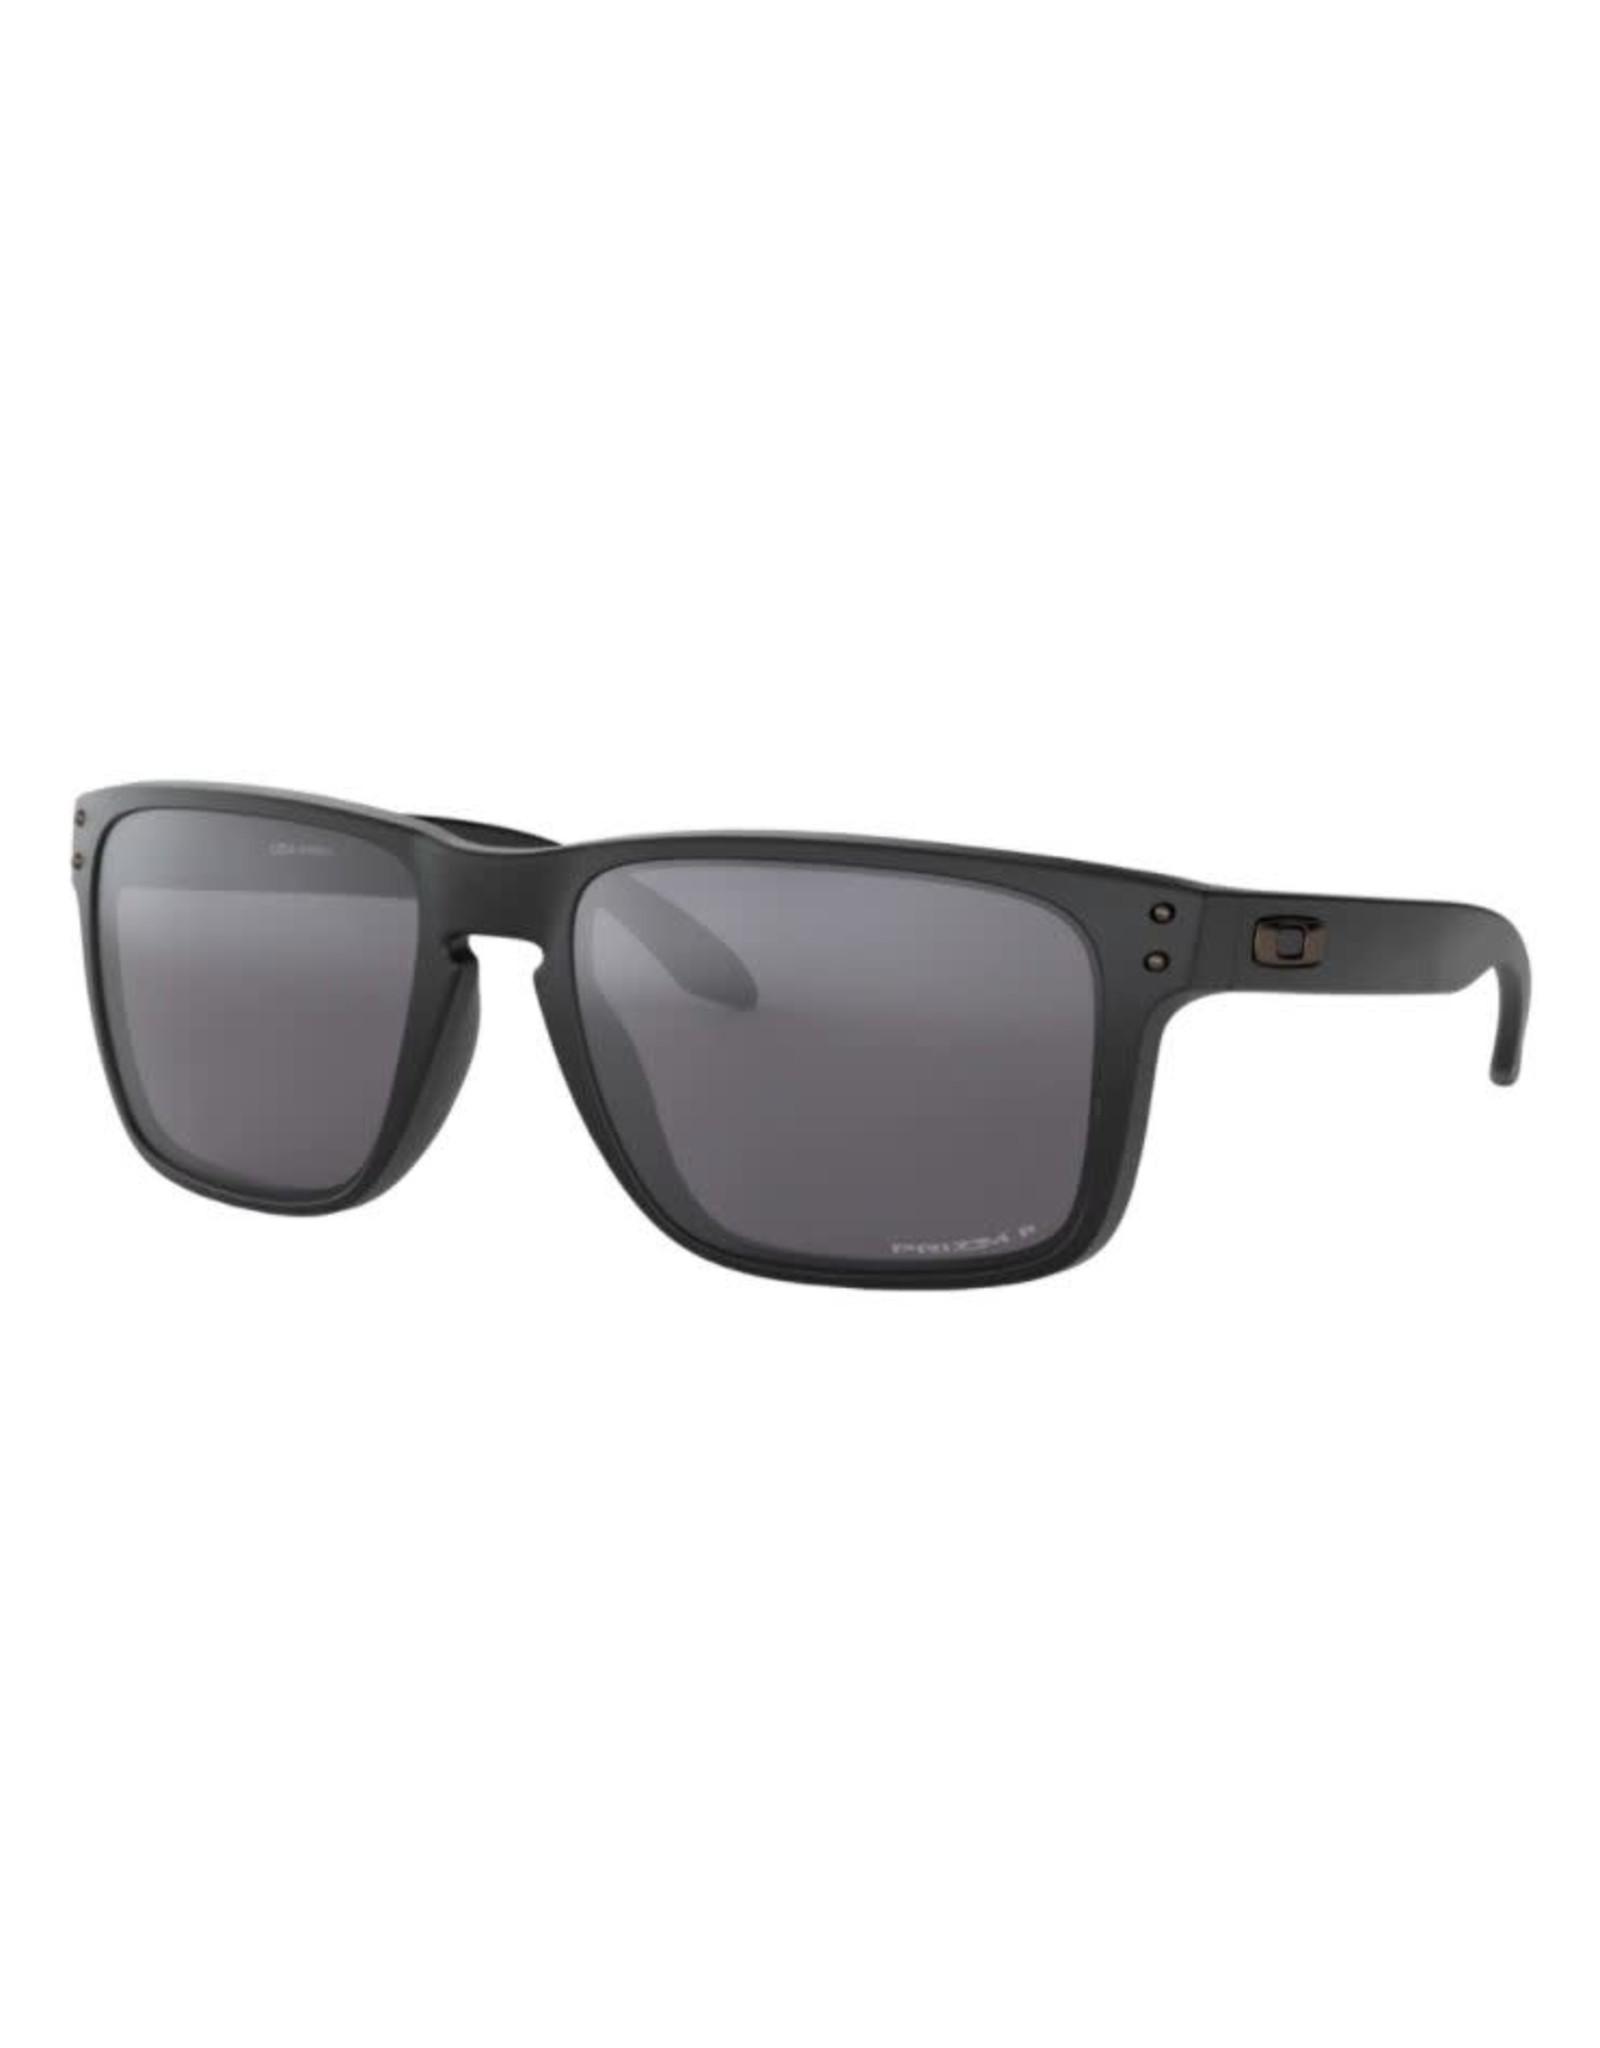 Oakley Oakley - Lunette soleil holbrook xl matte black /lens black polarized